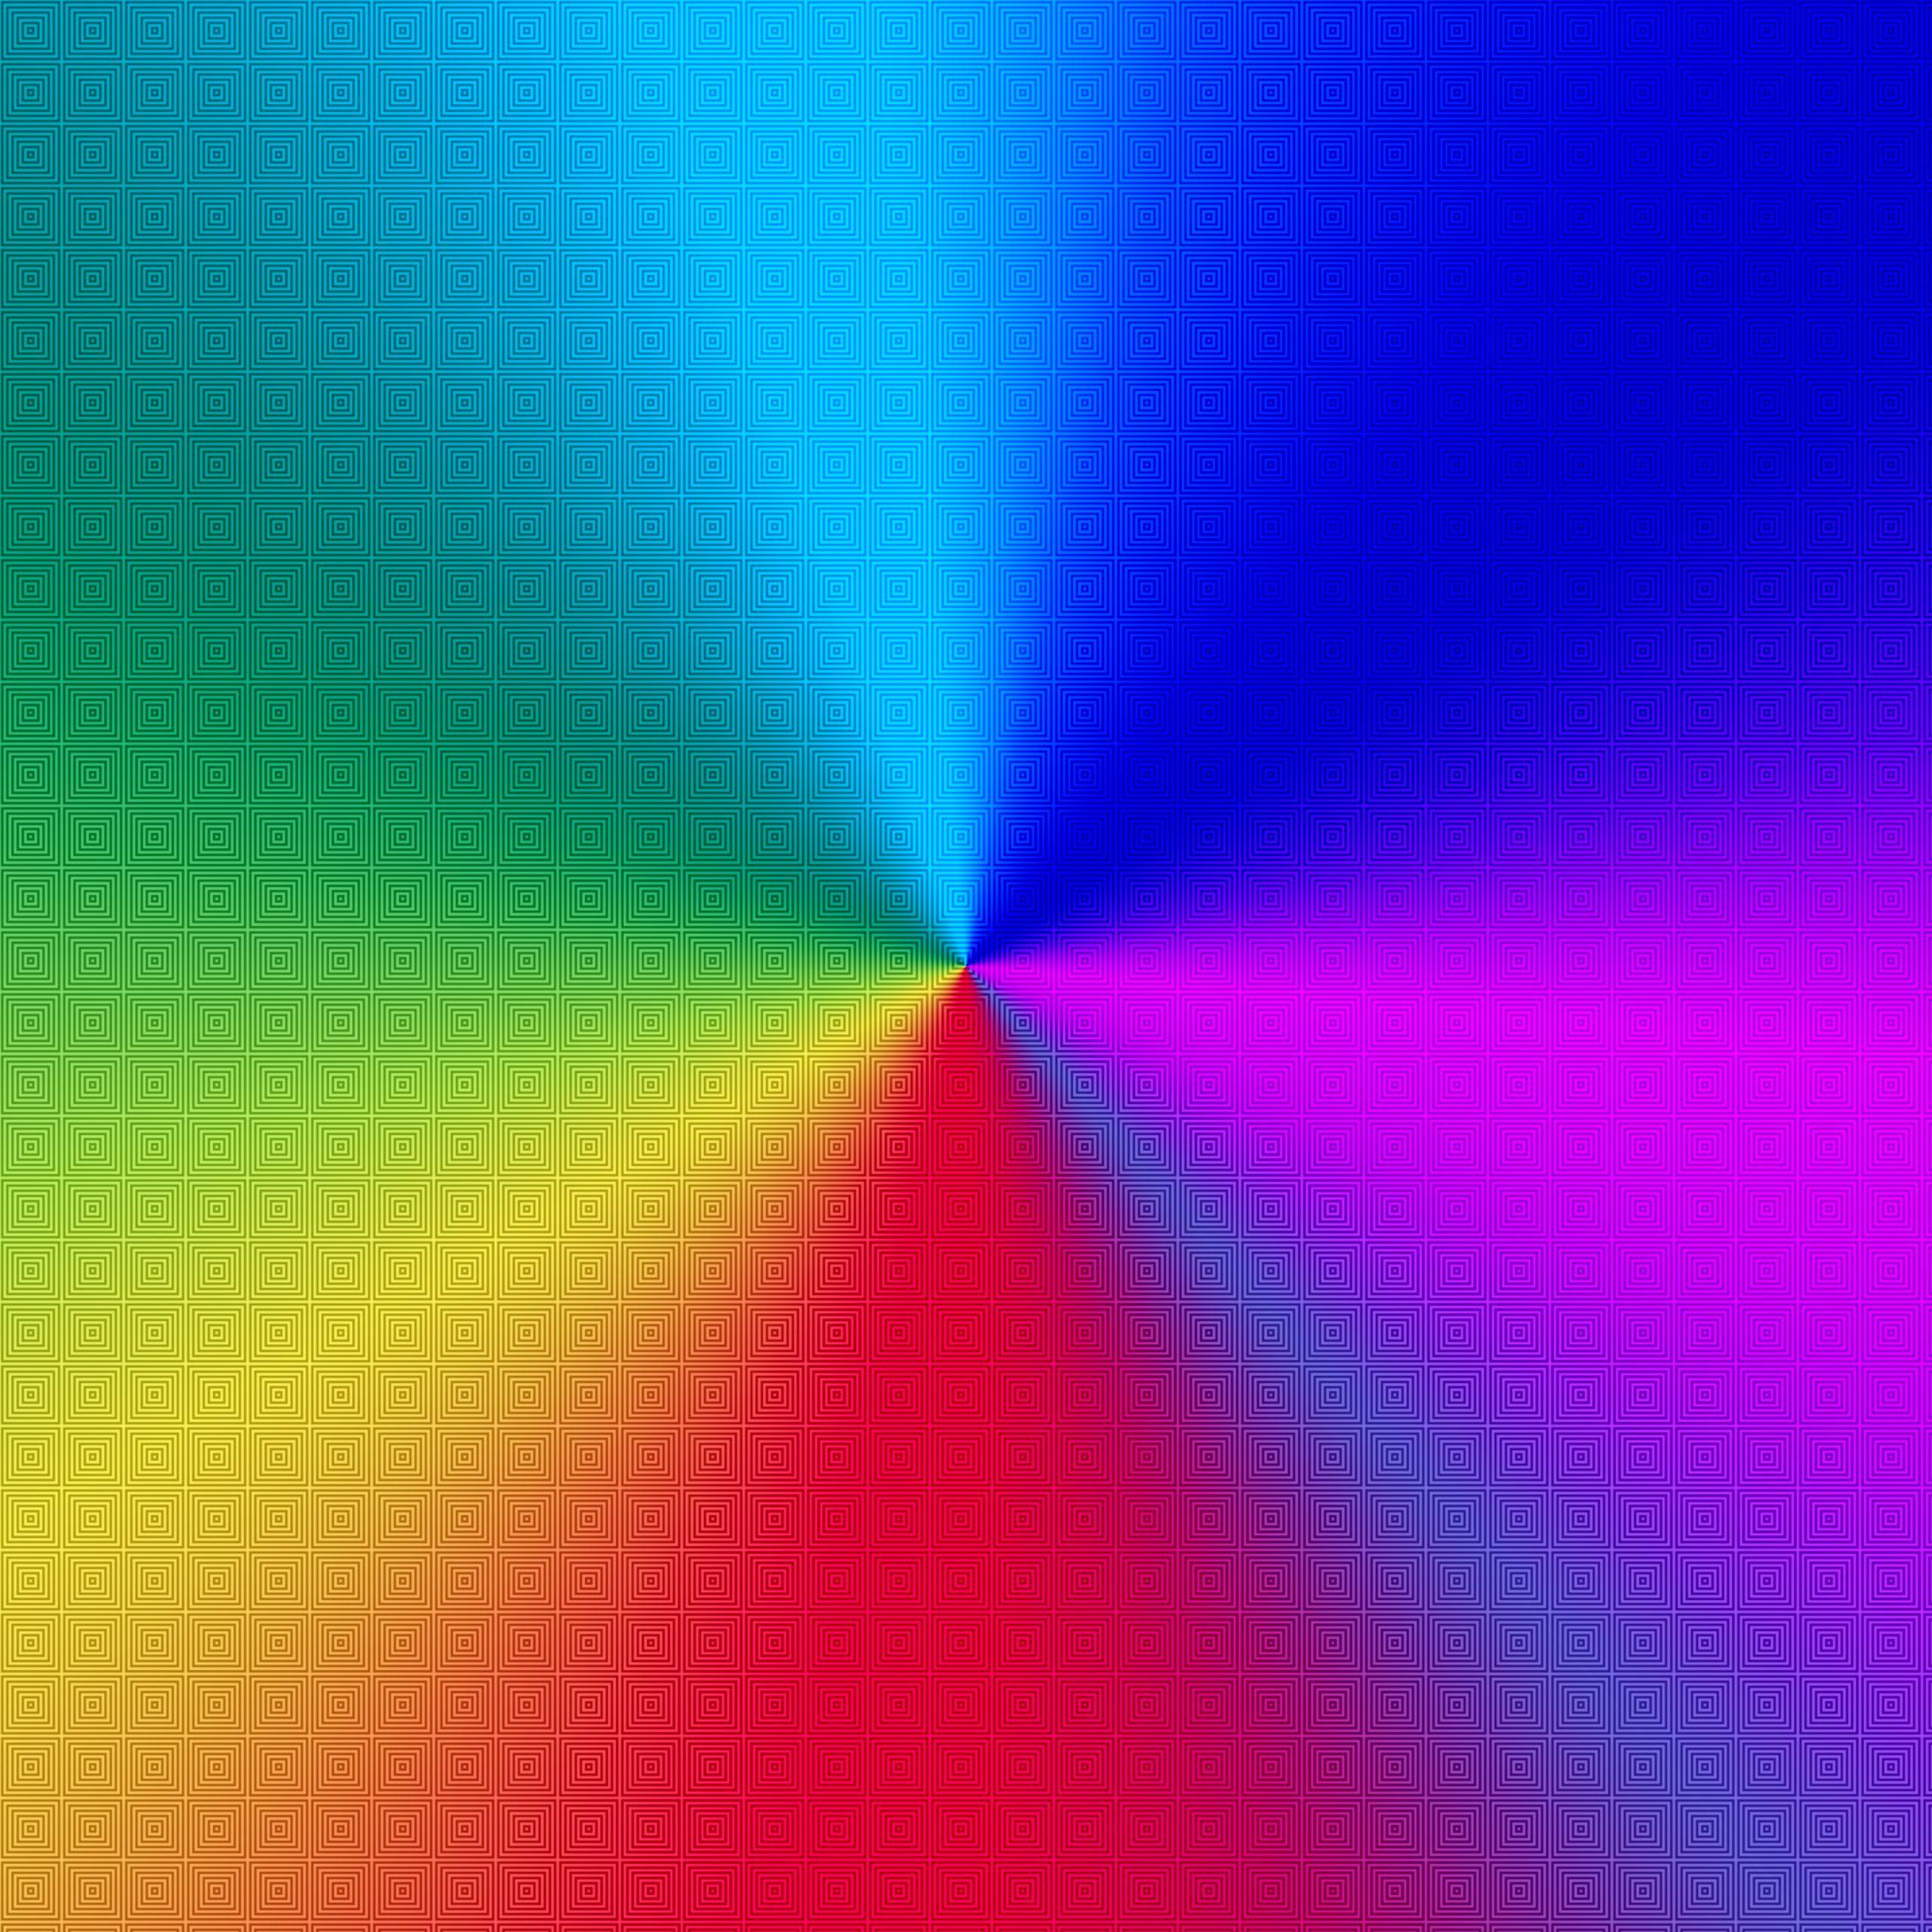 Colorful pattern design